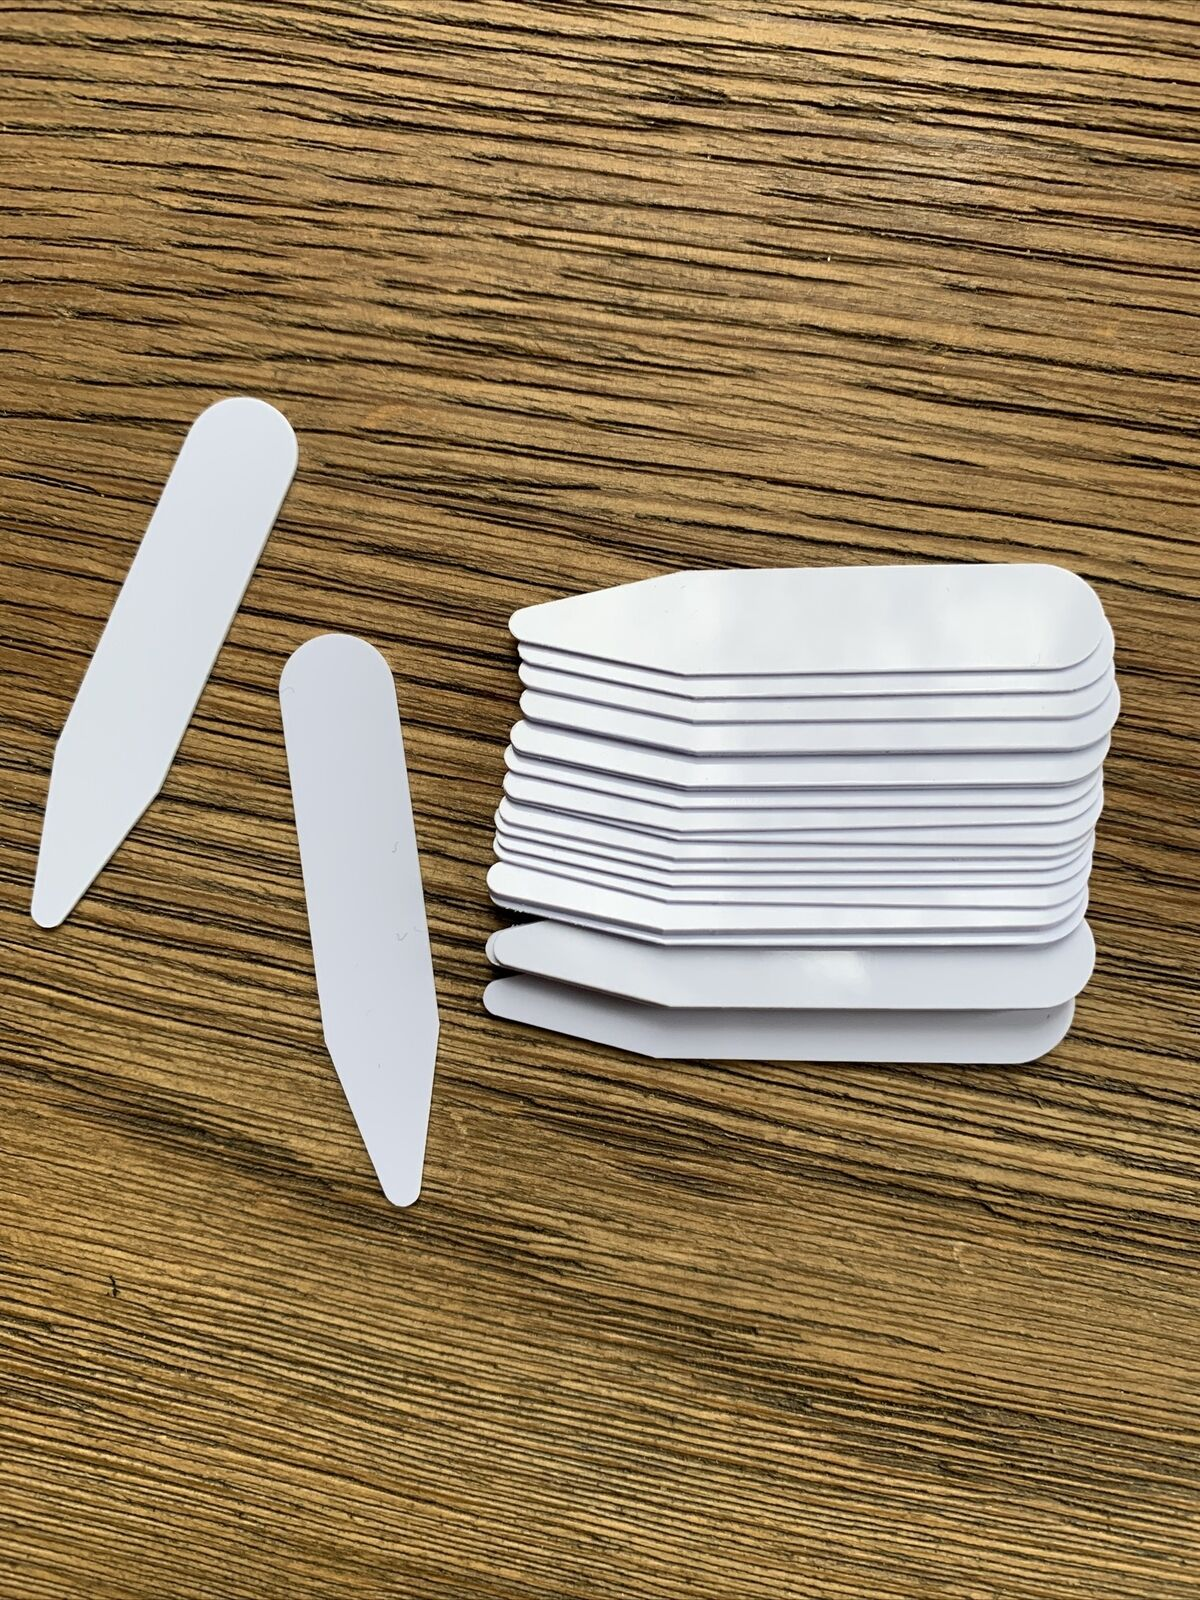 10 Pcs CollarStiffeners 5cm, Formal Men Shirt Bones Stays Inserts Plastic White